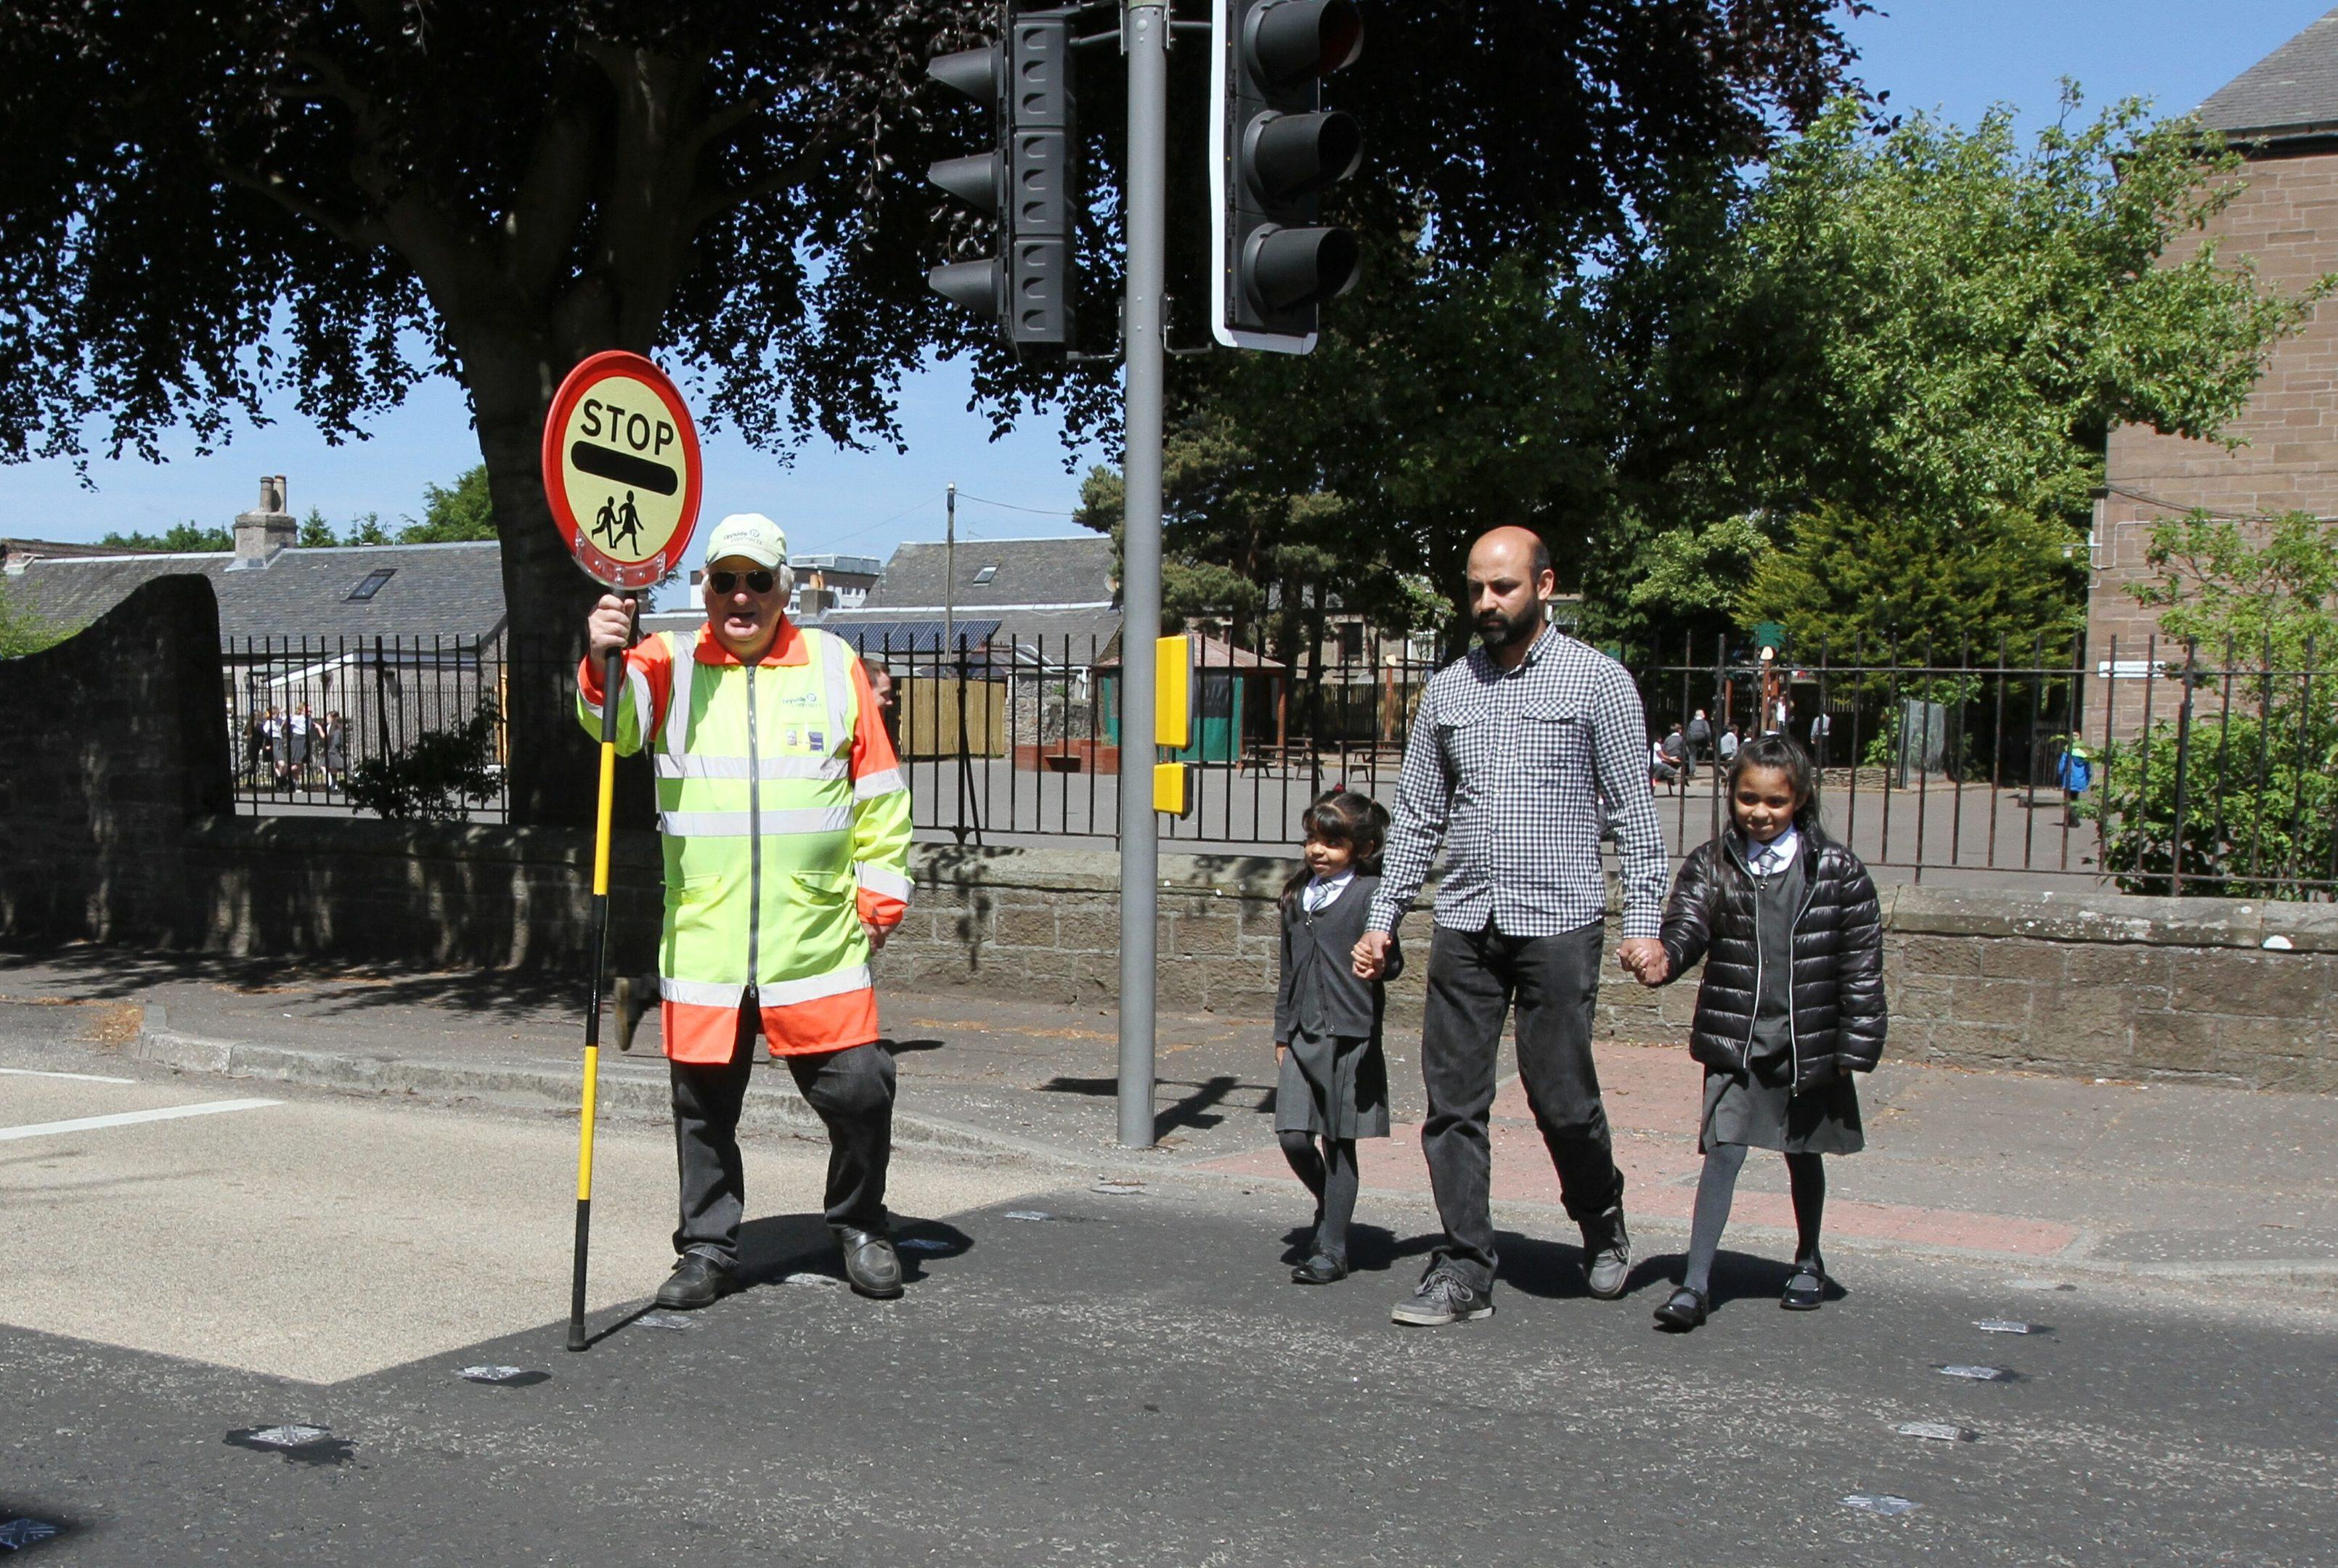 Ian Loney (70) helps Tasib Hussain and his daughters Ashlina (9) & Suhana (5) across  busy road